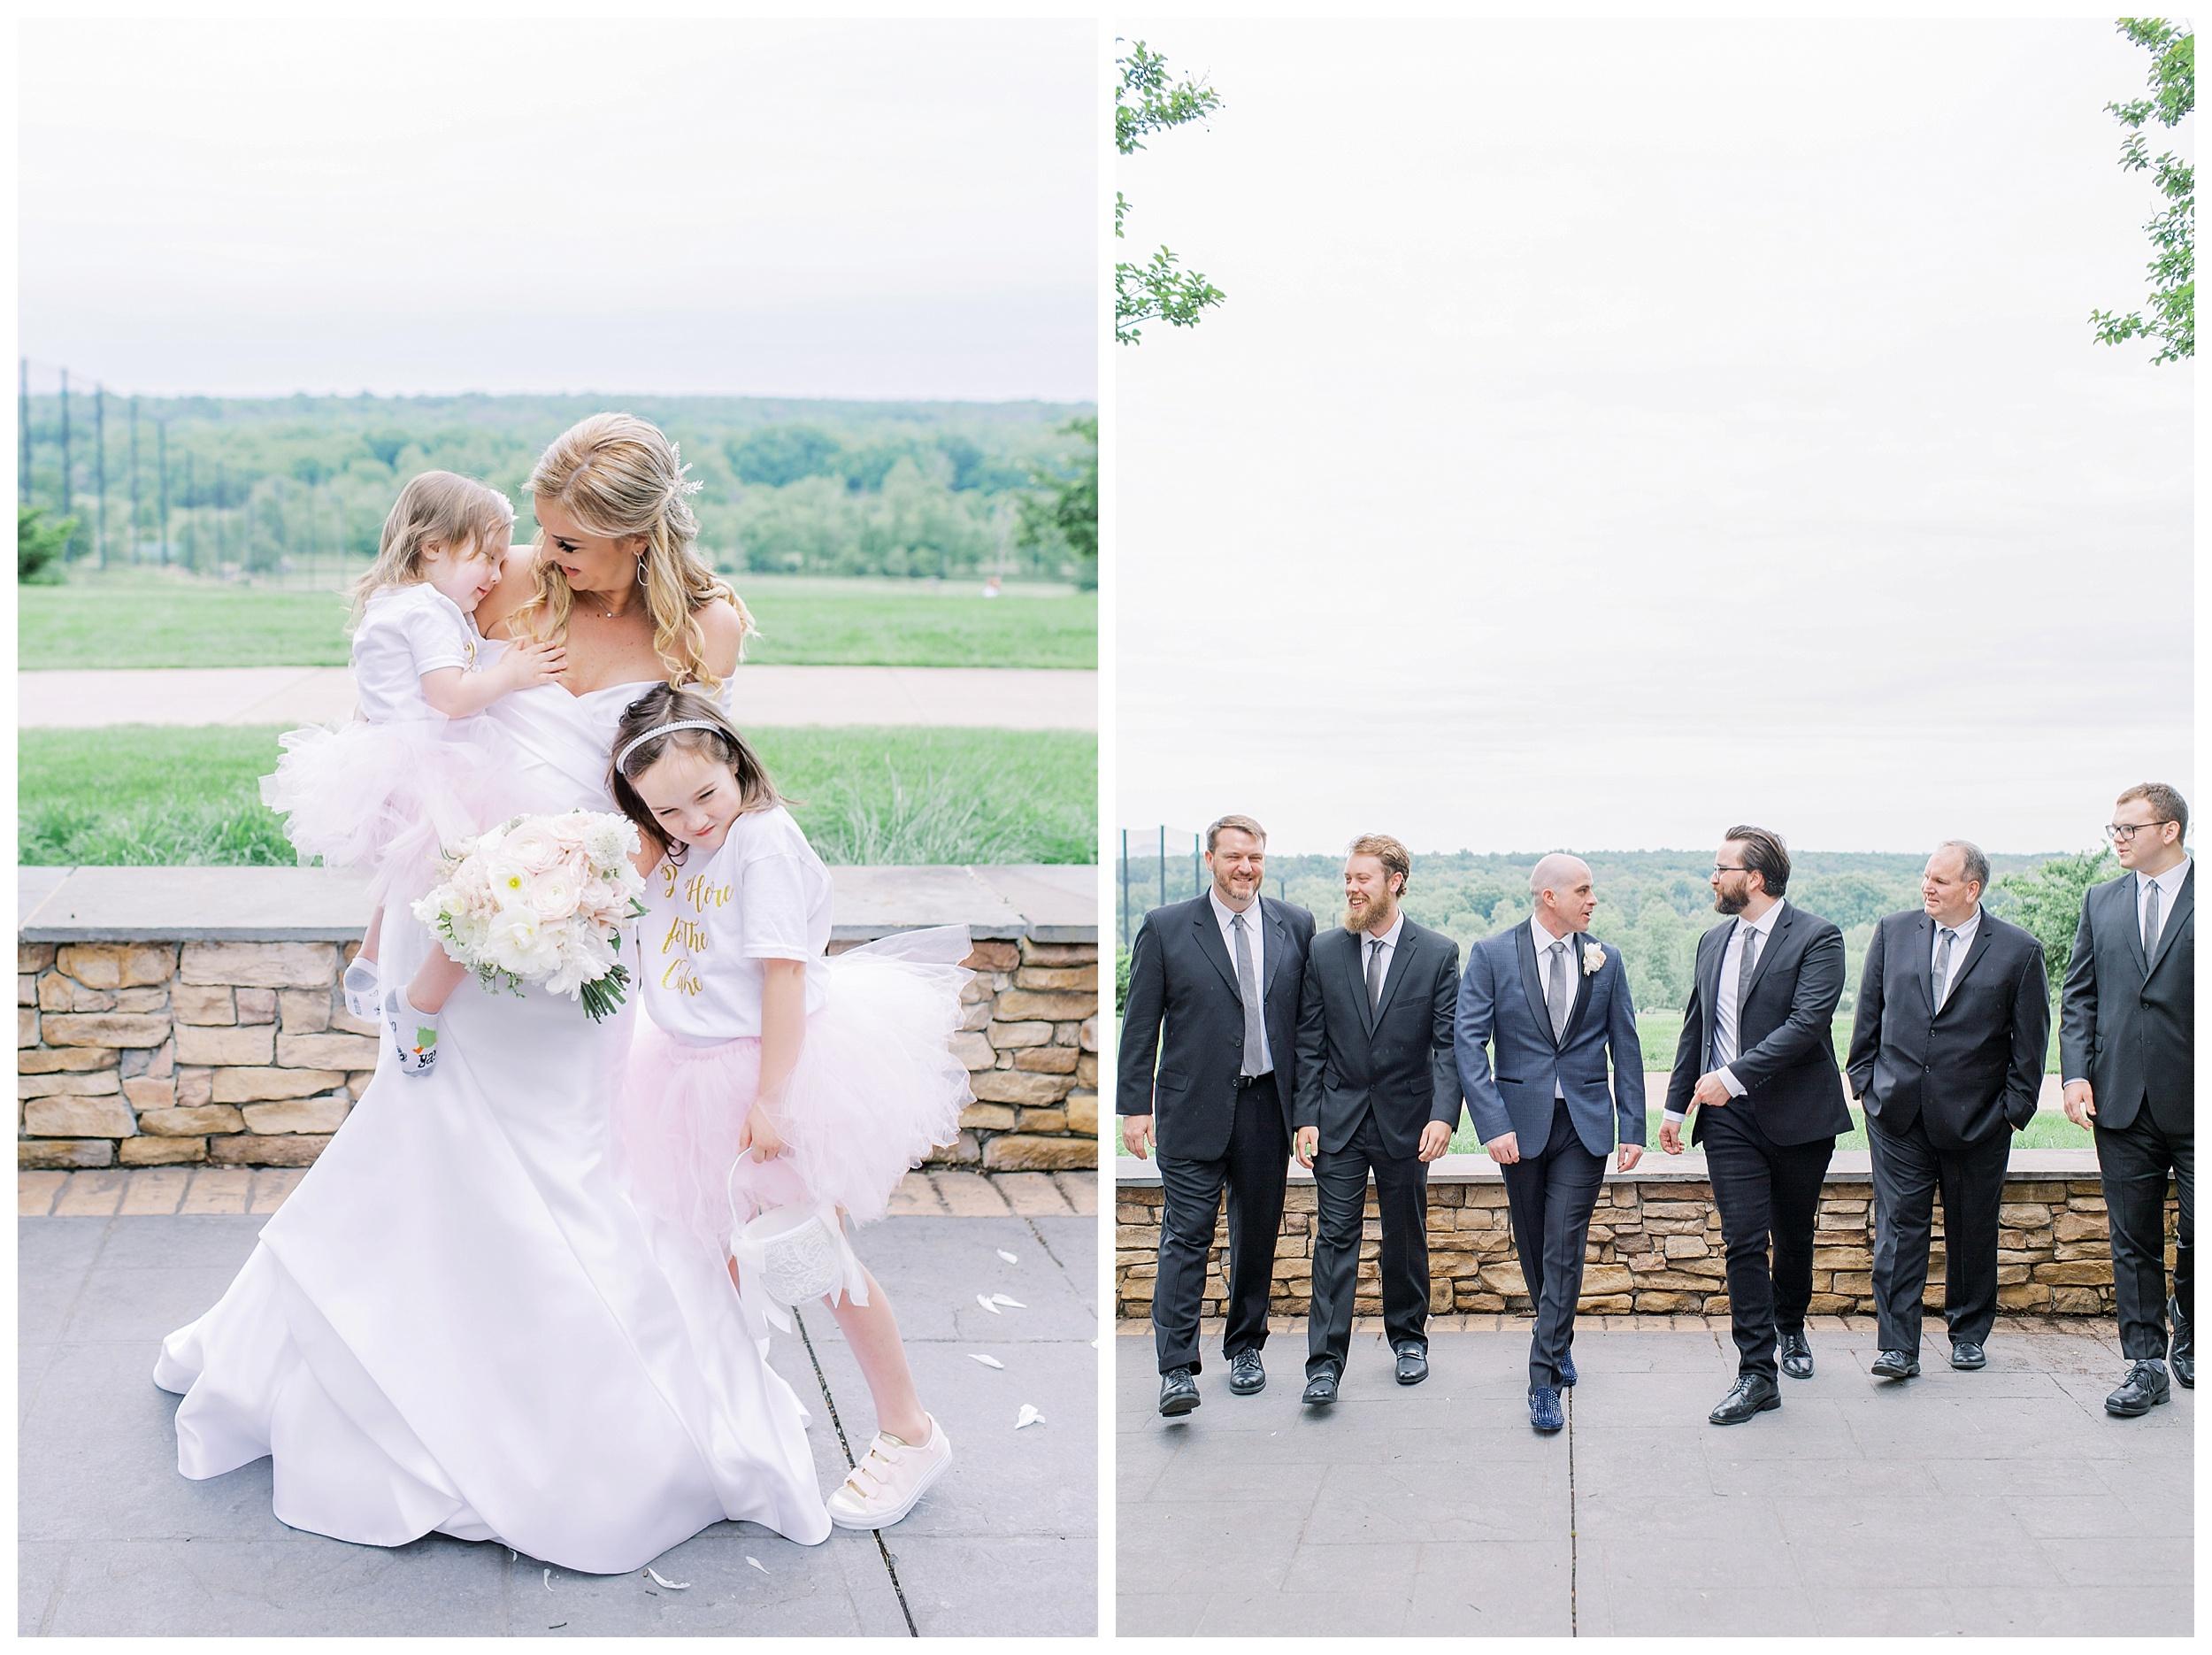 Lansdowne Resort Wedding | Virginia Film Wedding Photographer Kir Tuben_0027.jpg